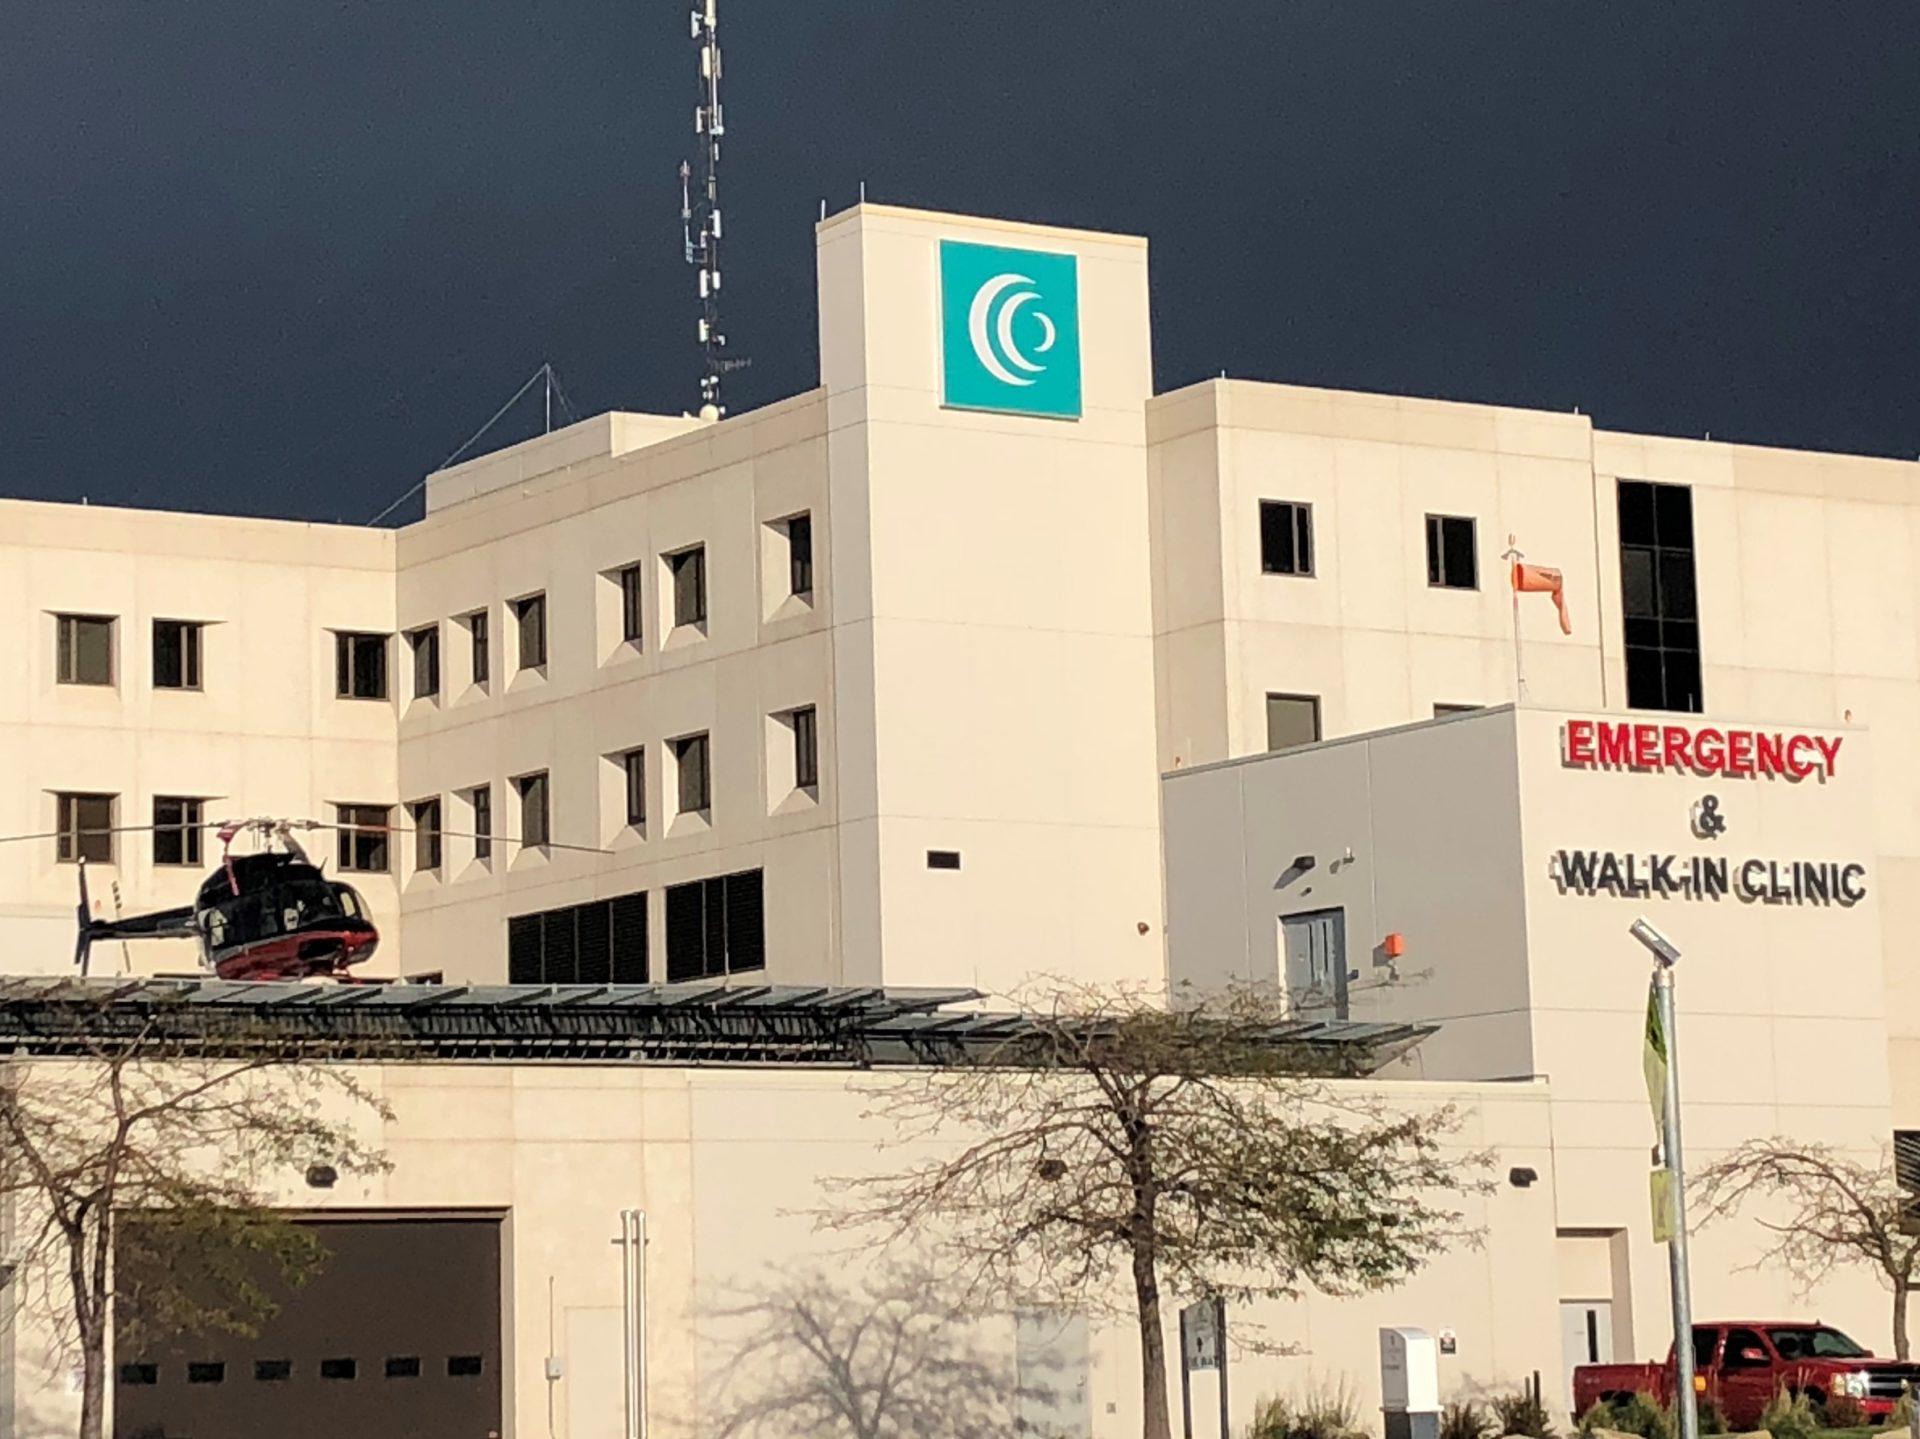 Campbell County Memorial Hospital